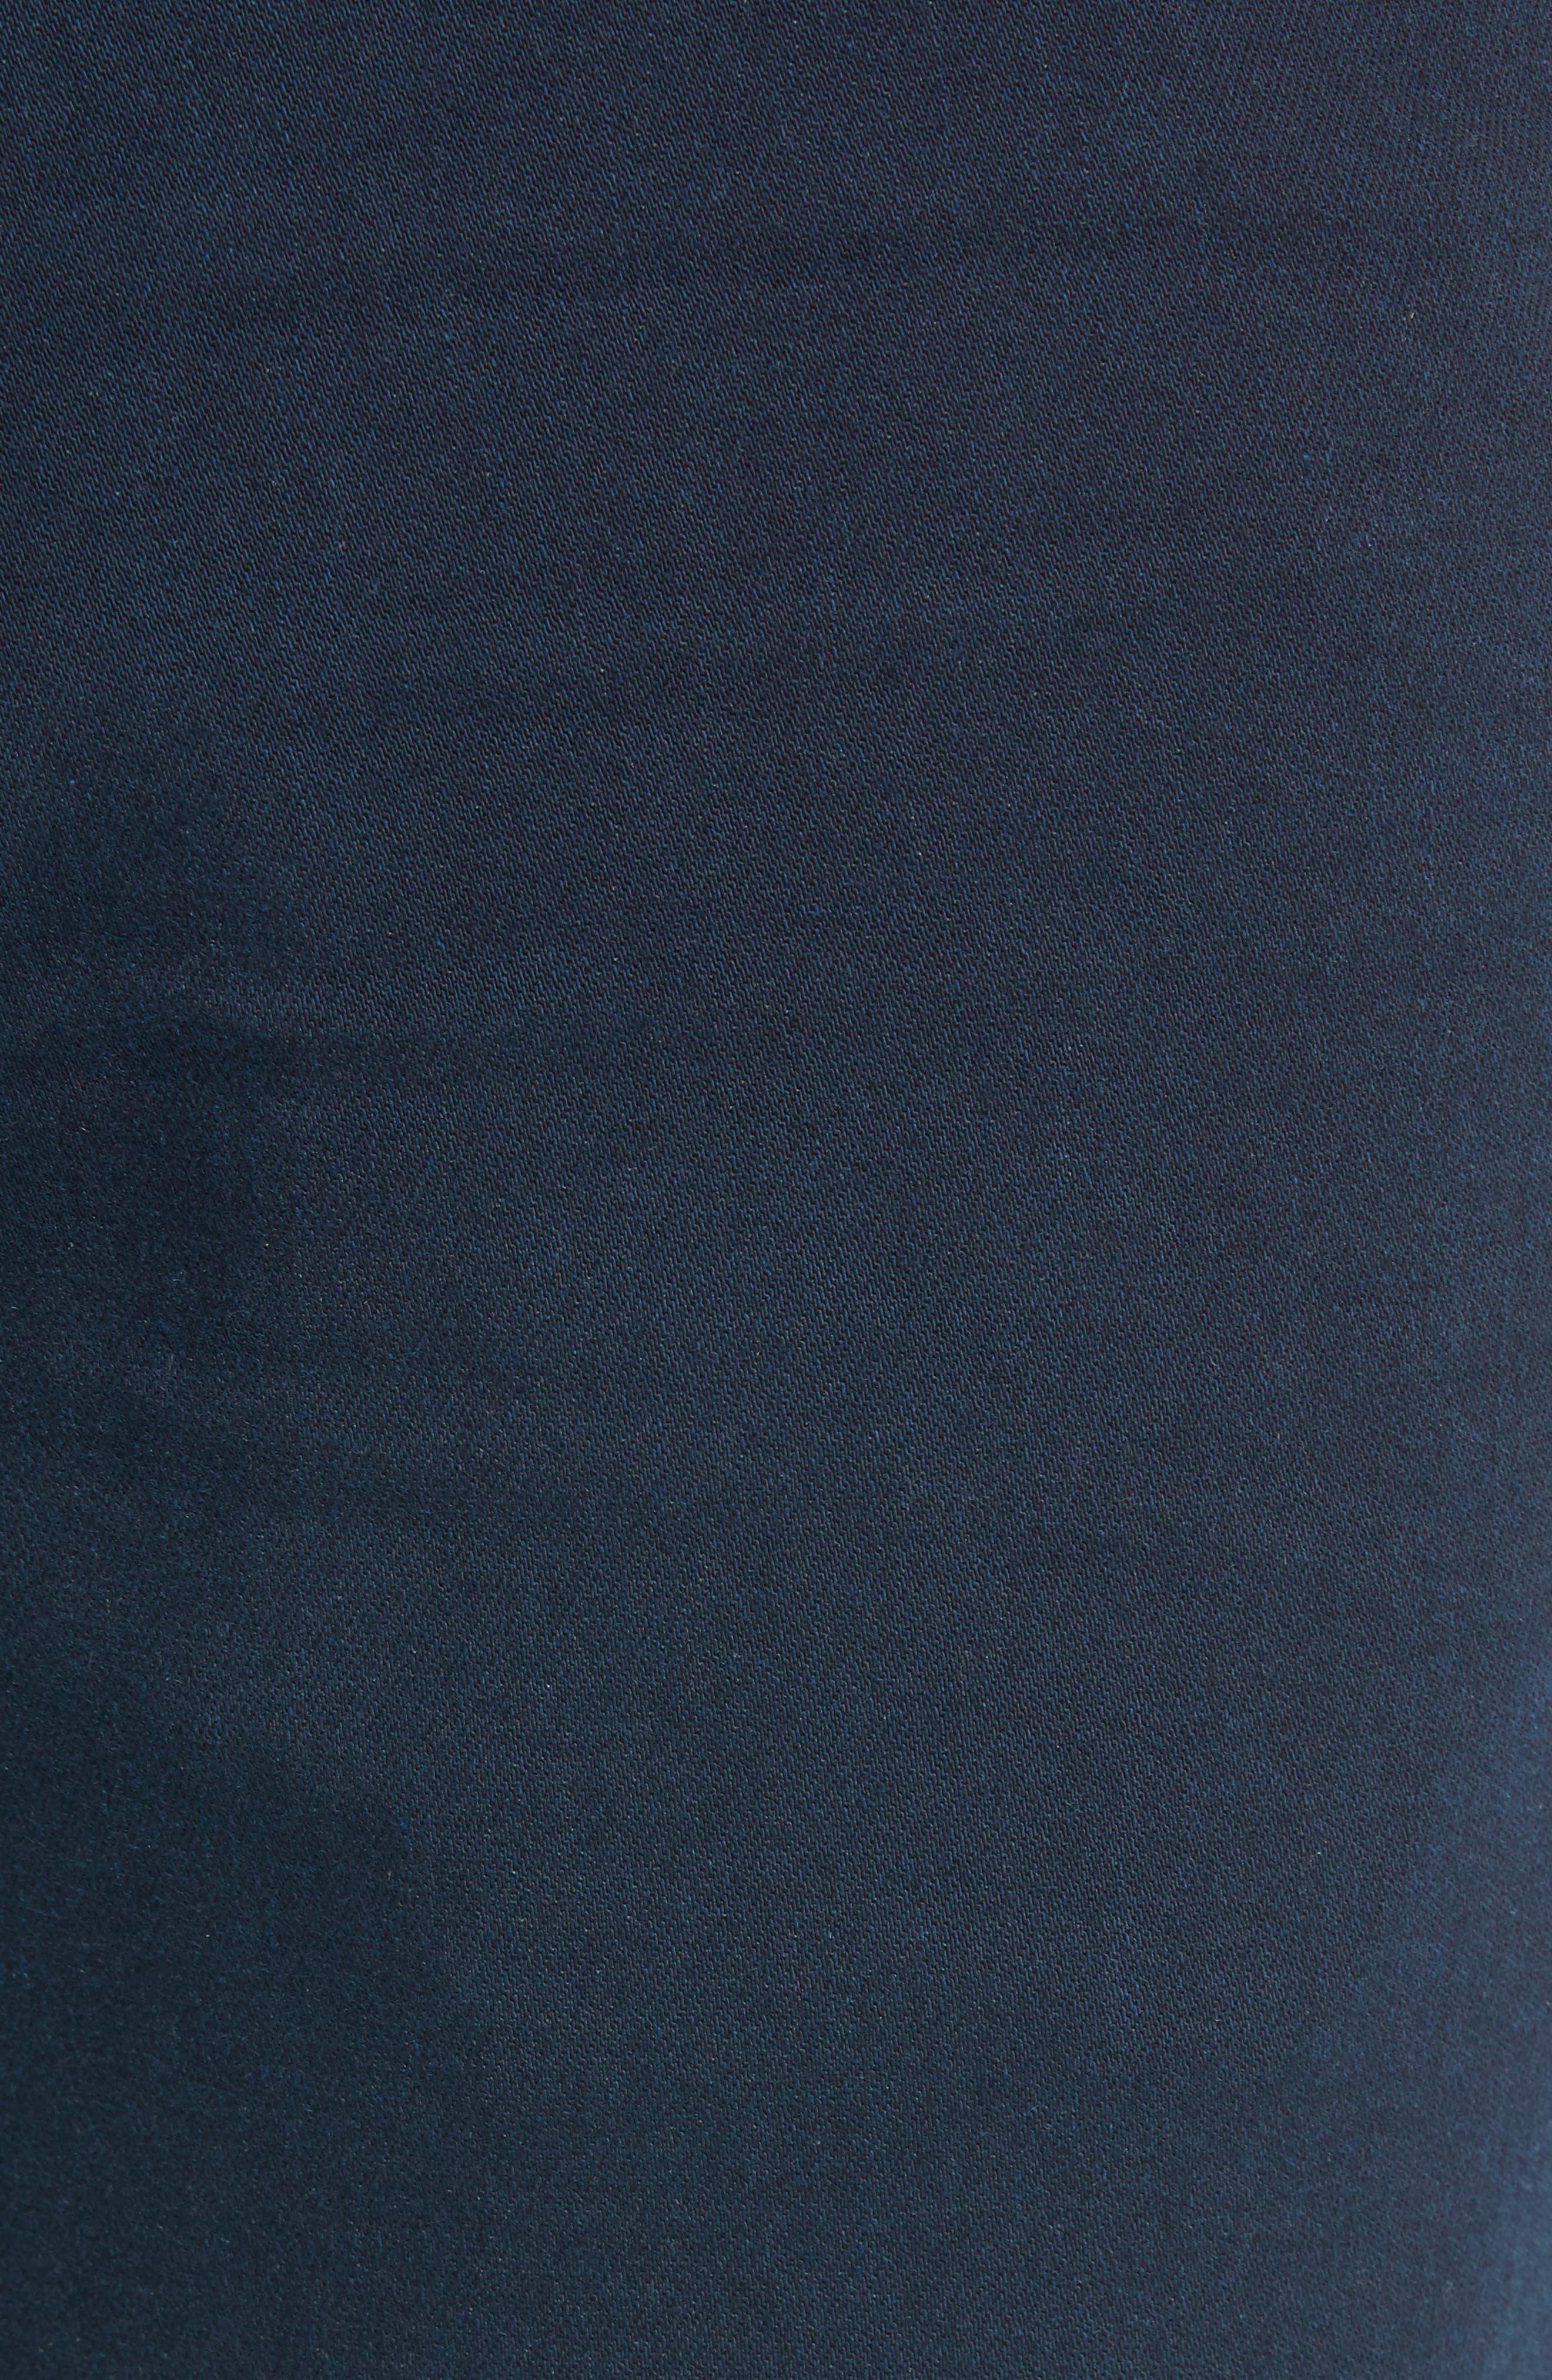 Transcend - Lennox Slim Jeans,                             Alternate thumbnail 5, color,                             401